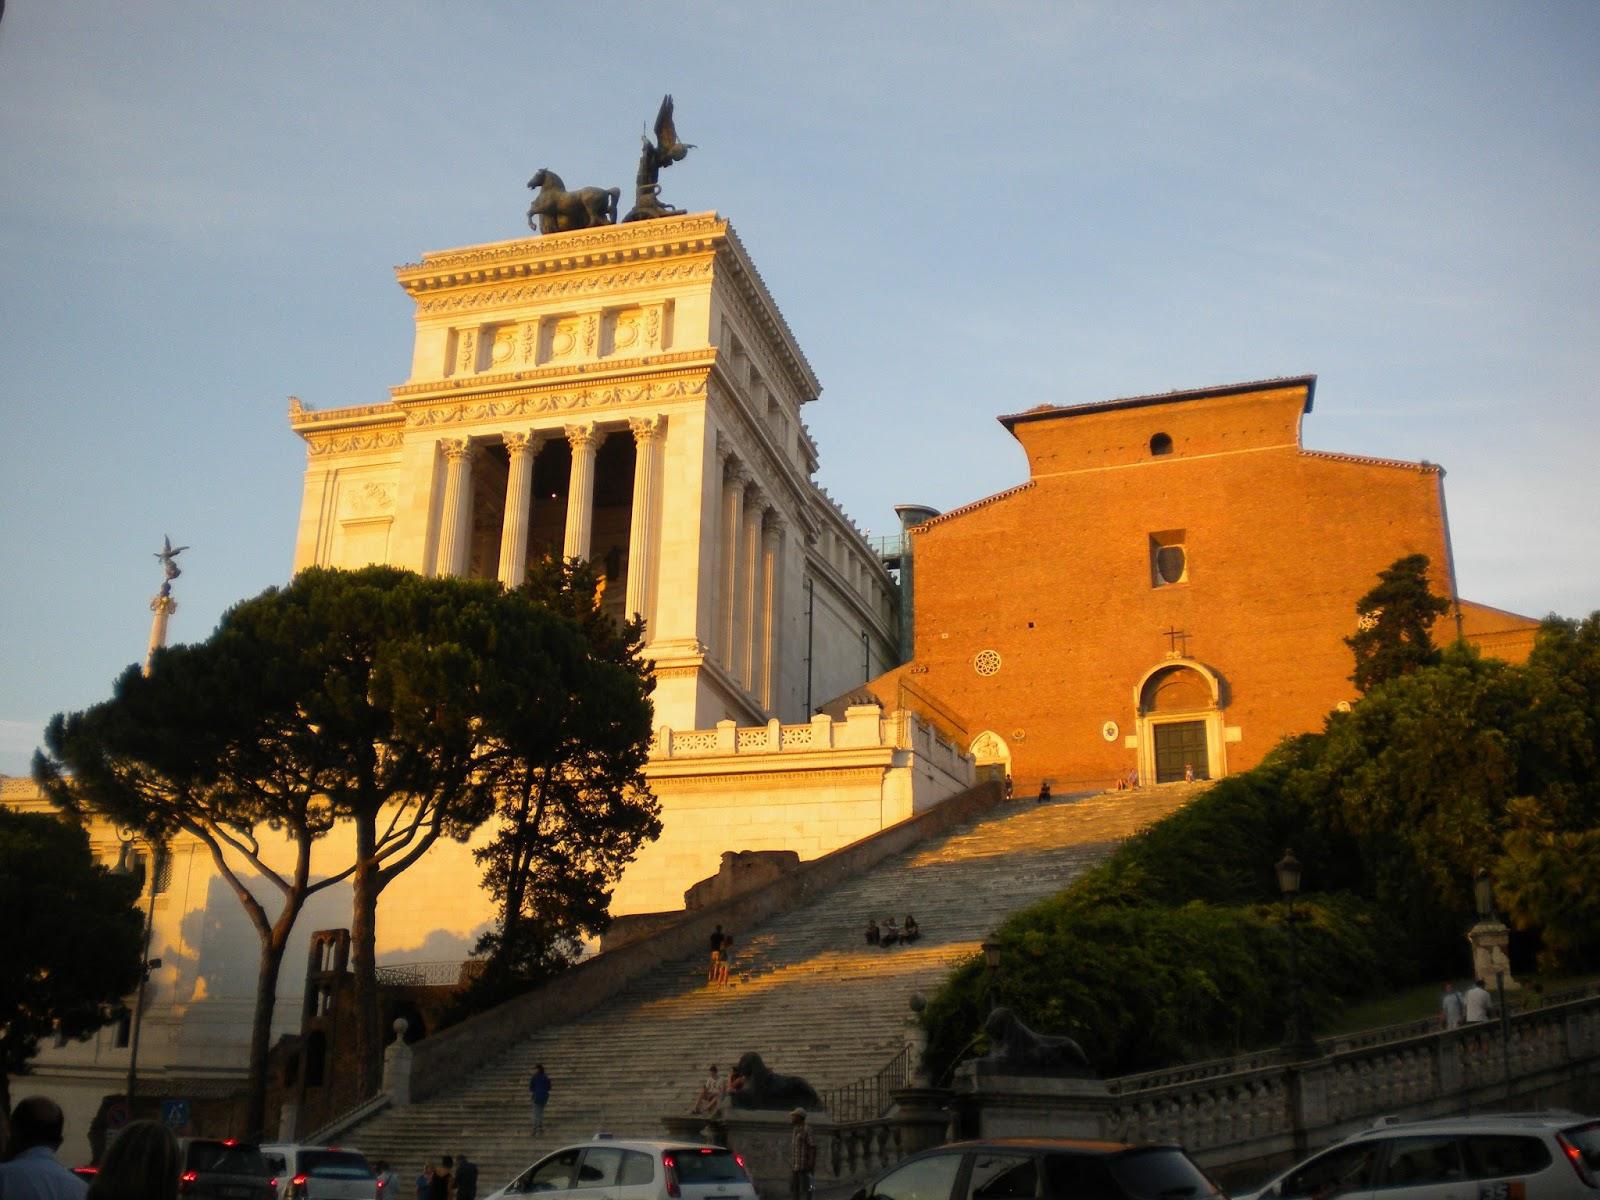 Castel Santangelo Mausoleo